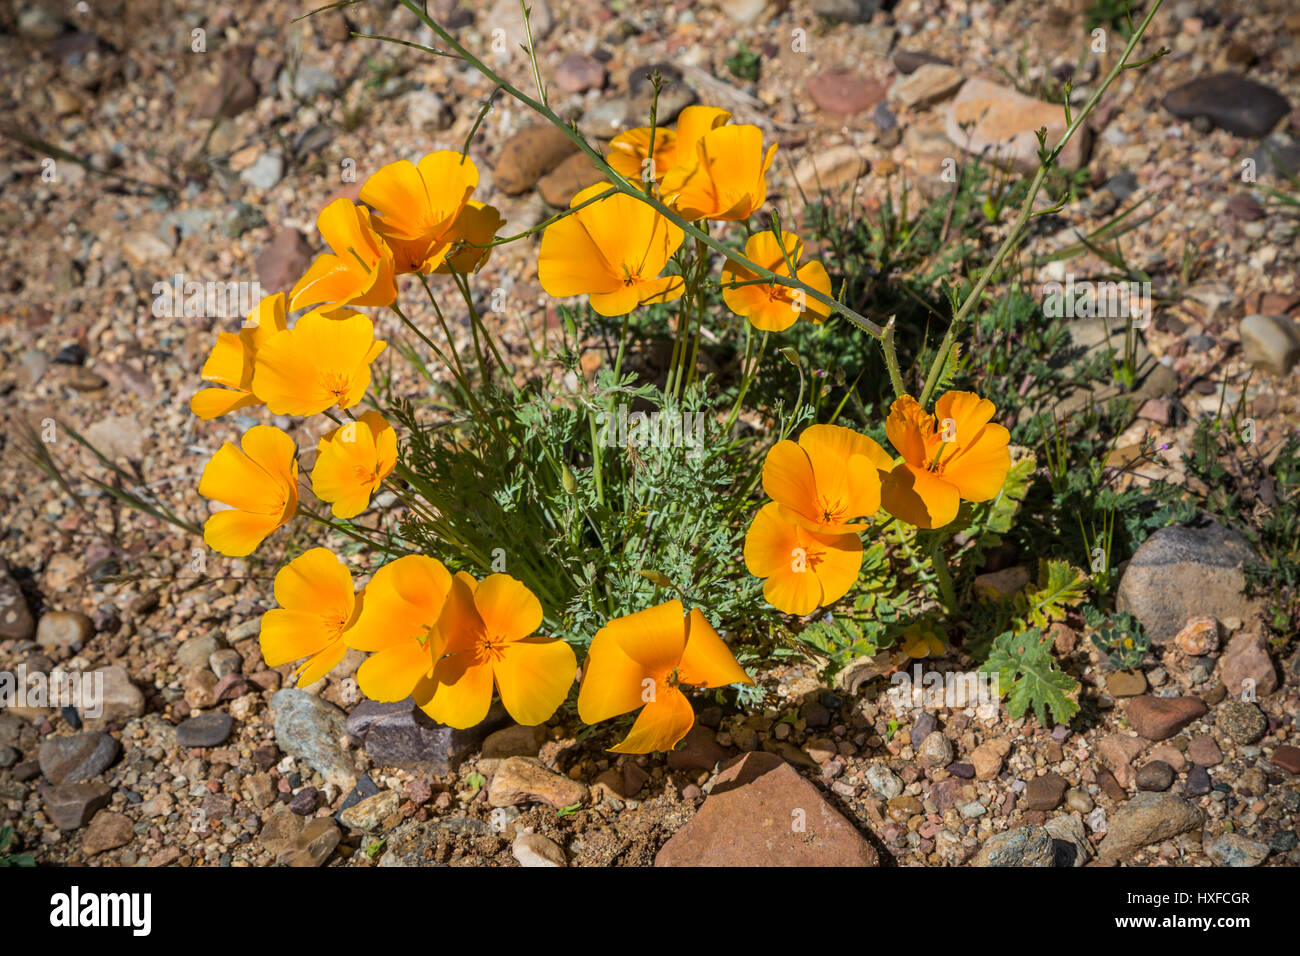 Mexican Gold poppies blooming in Peridot Mesa at the San Carlos Apache Reservation near Globe, Arizona, USA. - Stock Image